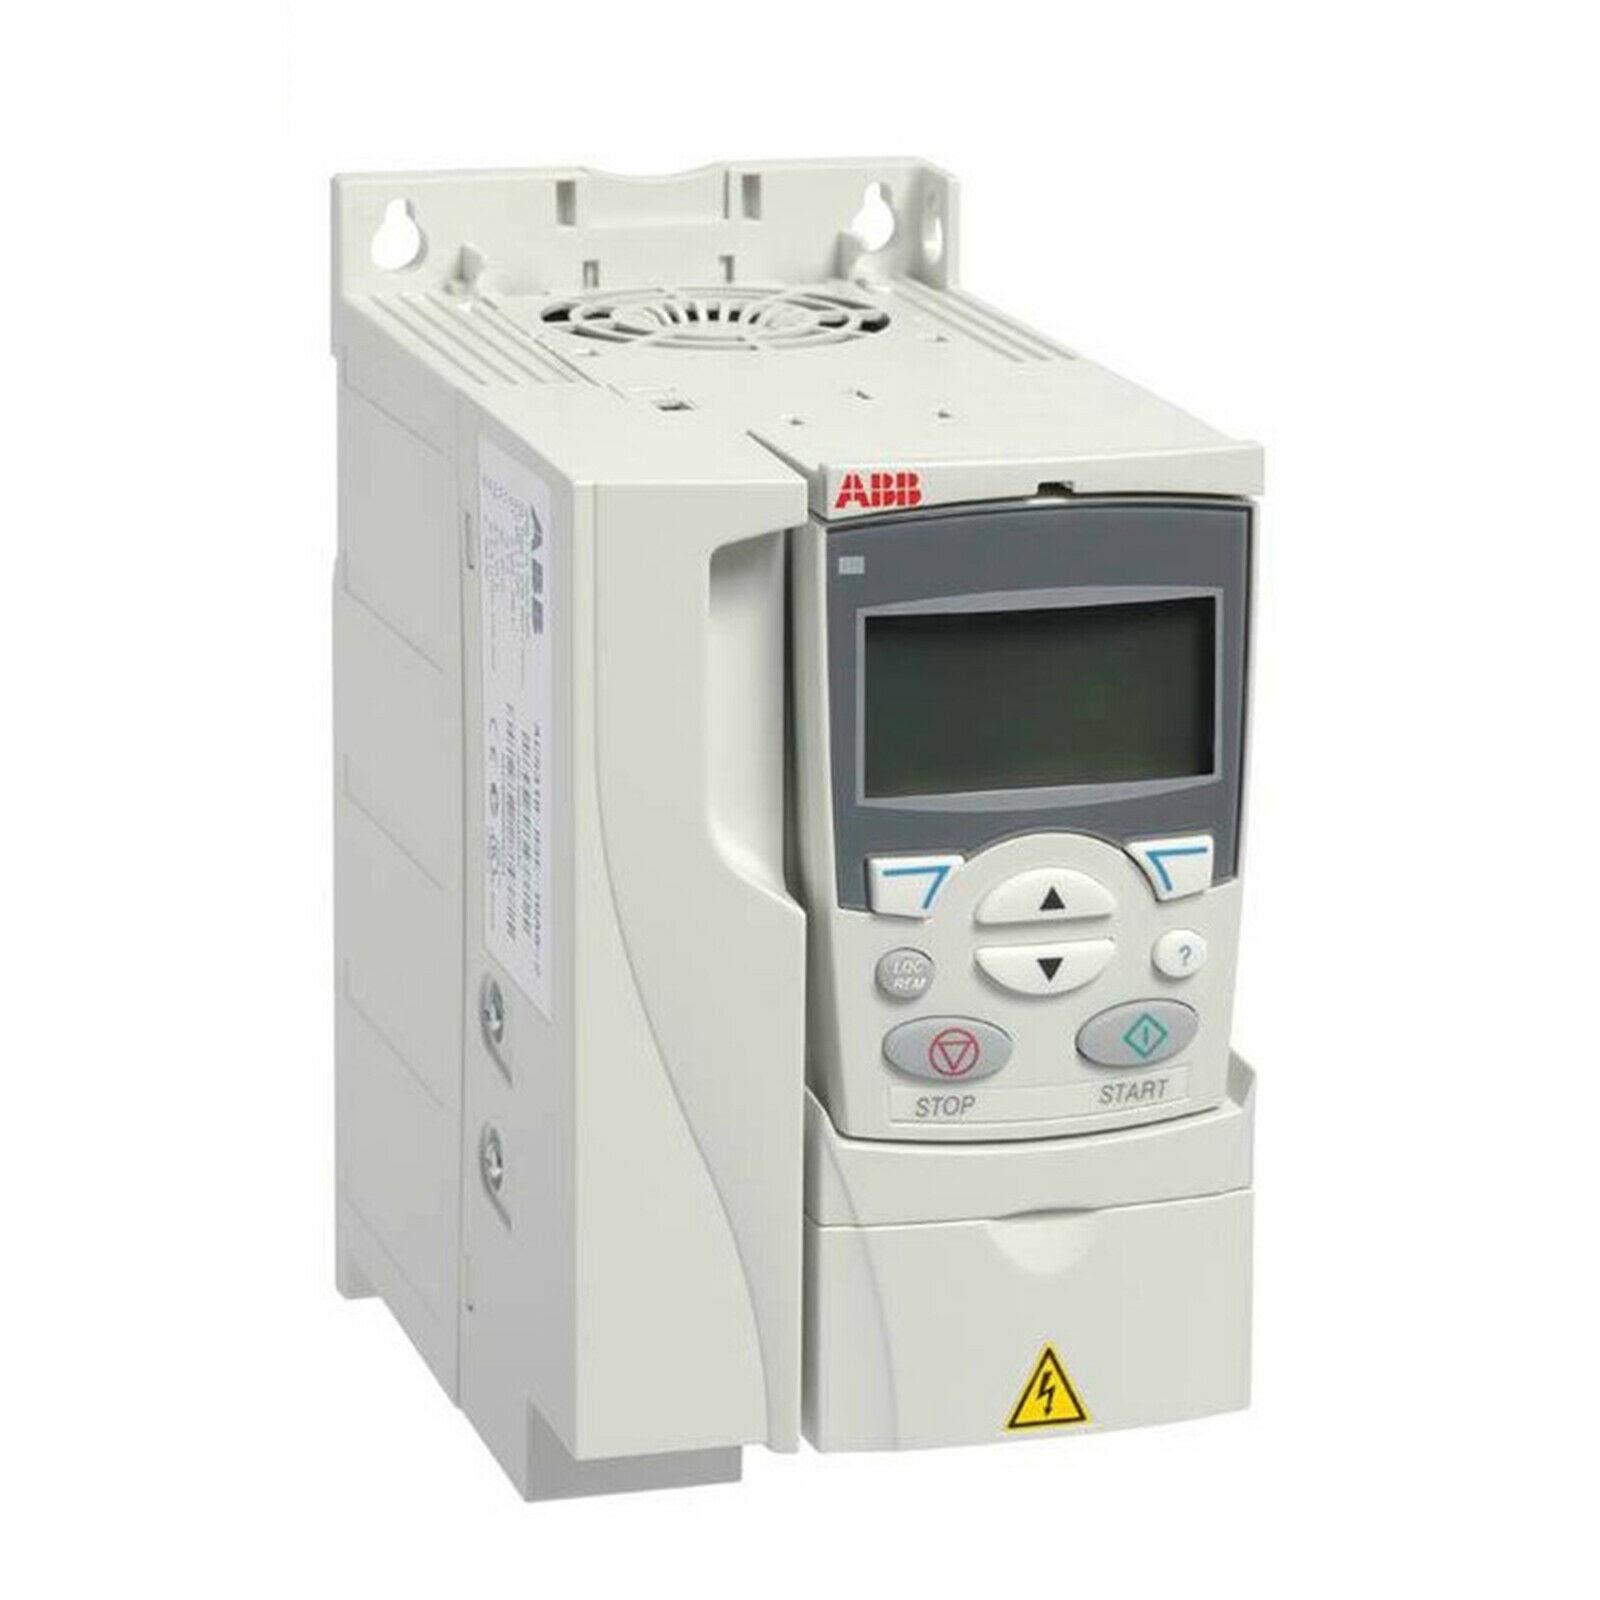 ACS355-01E-09A8-2